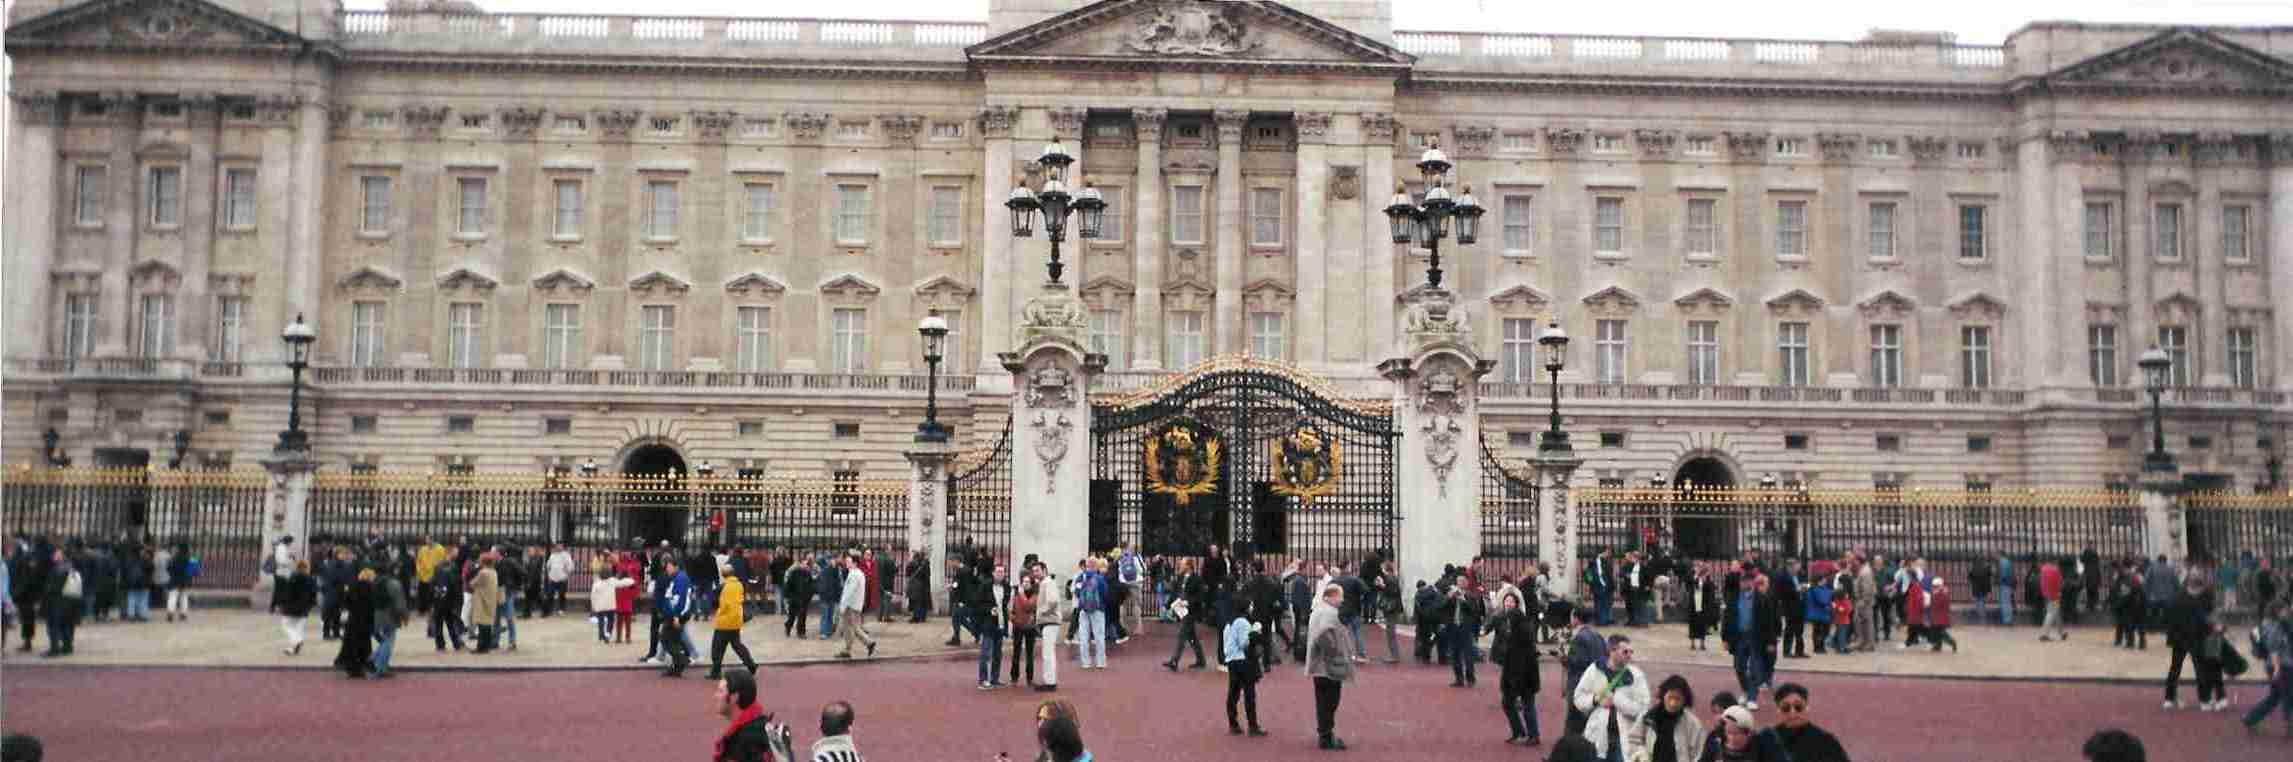 2000 Europe 00 Buckingham London